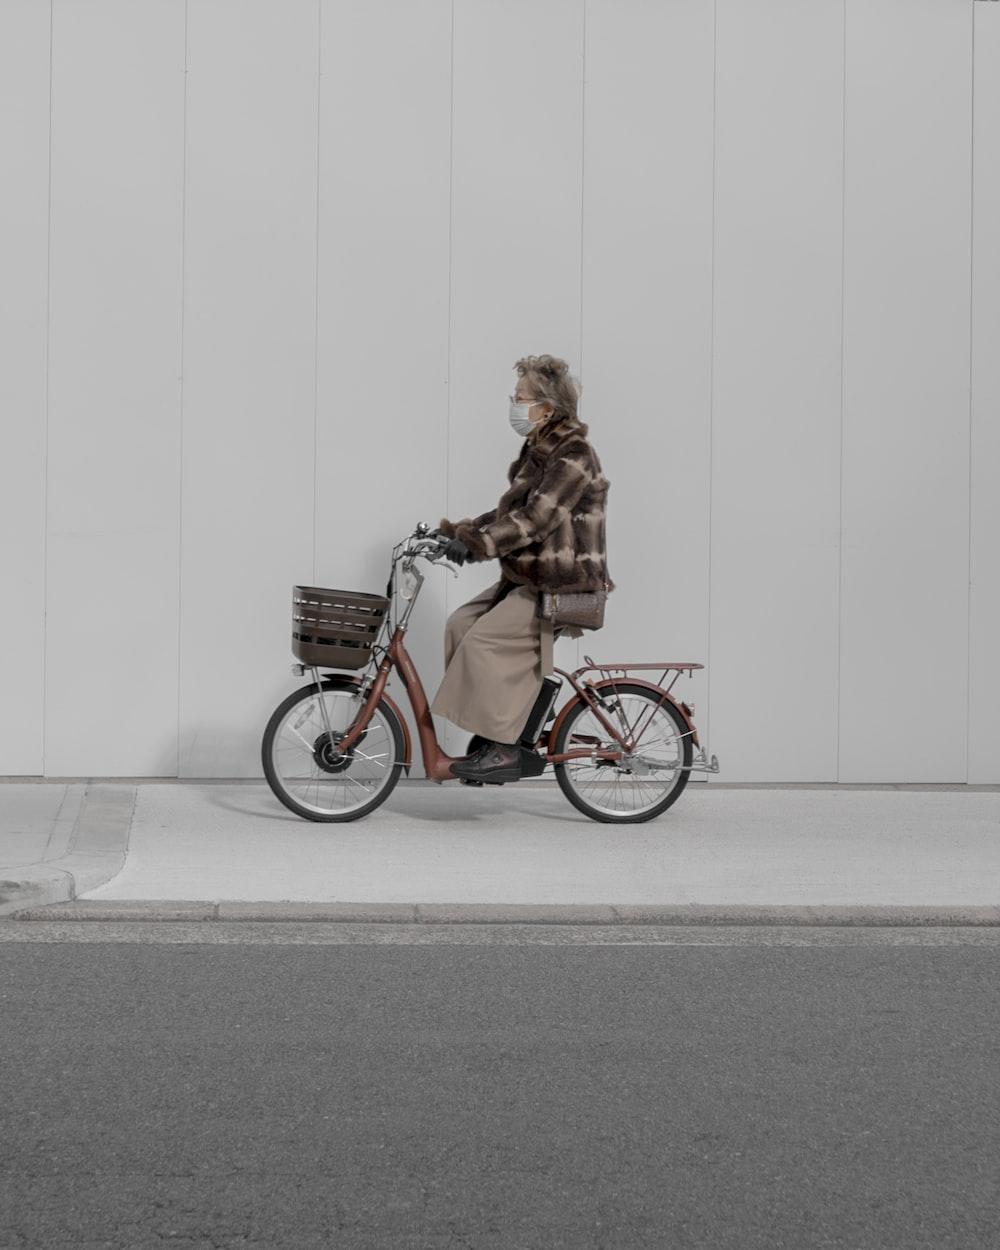 woman riding city bike near wall and road